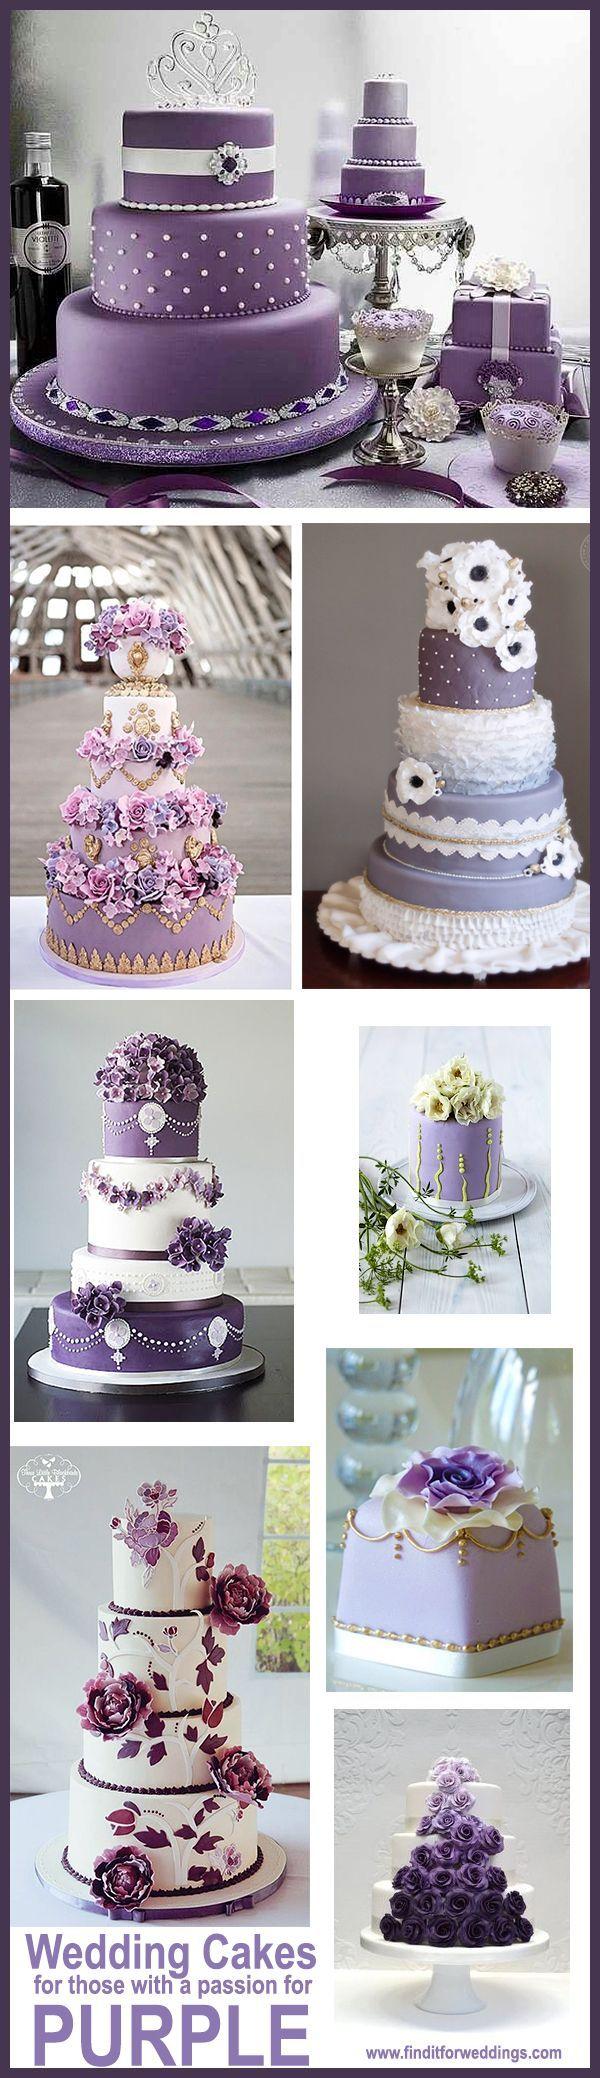 More wedding cake ideas: http://tips-wedding.com/wedding-cake-ideas/ This months favorite purple wedding cakes « FindItforWeddings FindItforWeddings